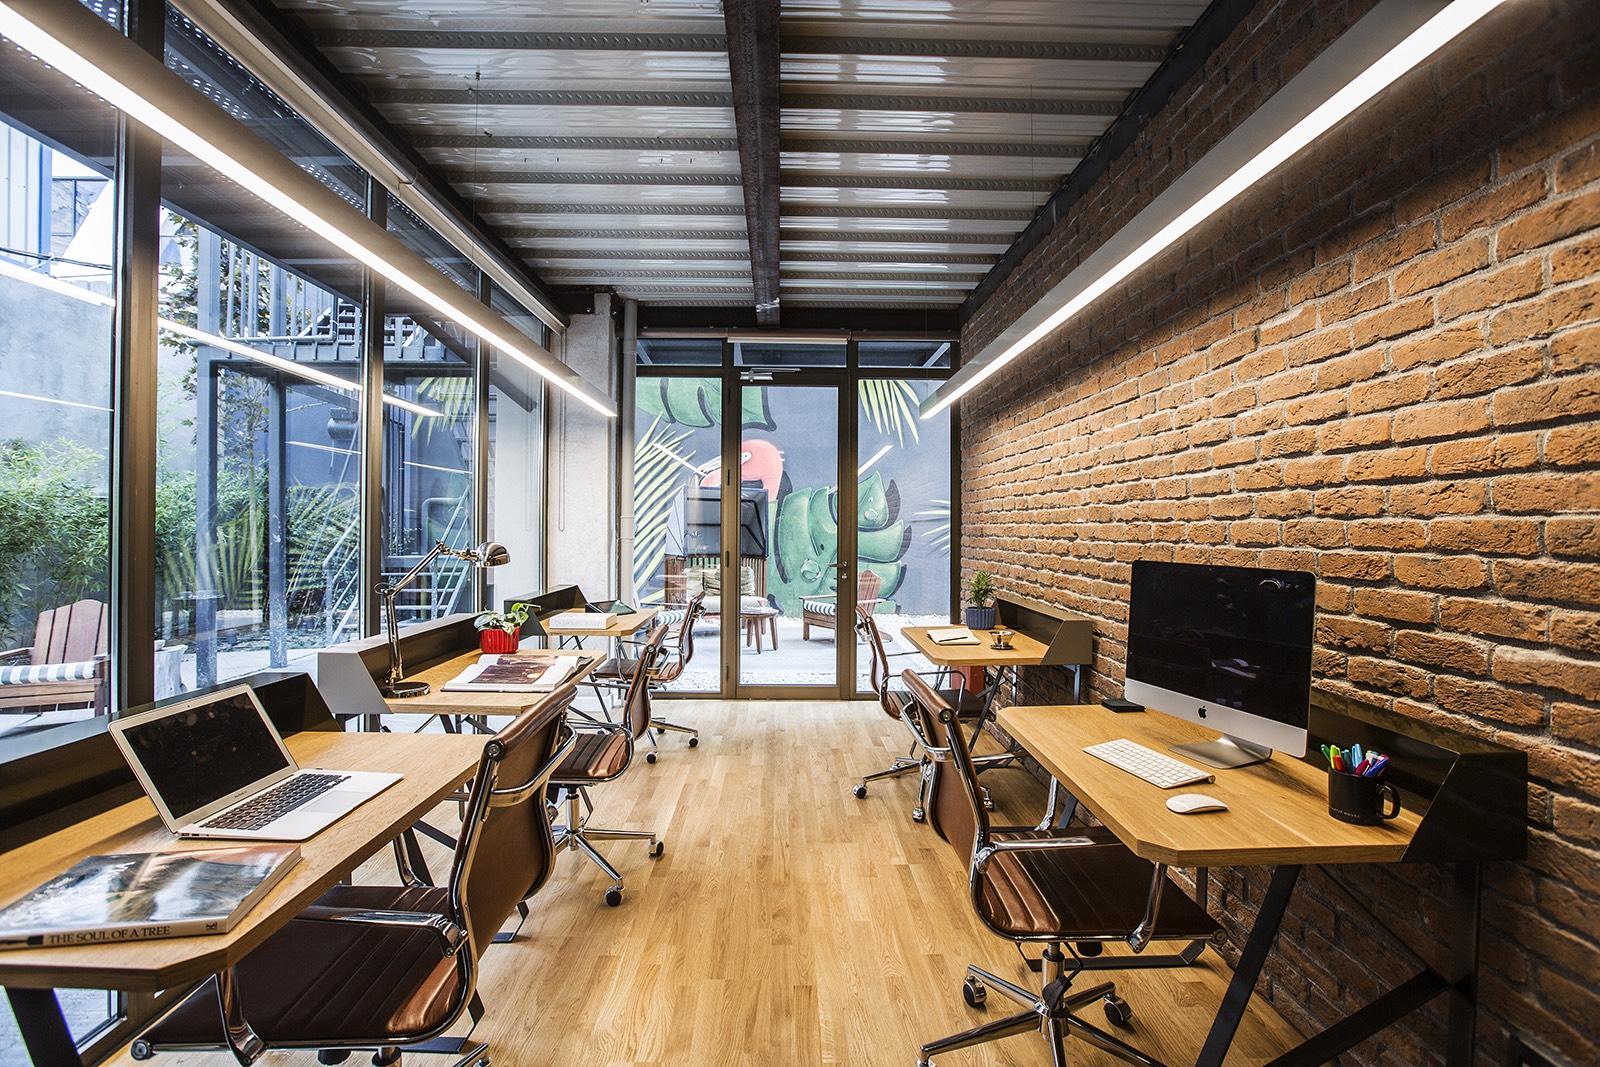 Another Look Inside Kolektif House S Coworking Space